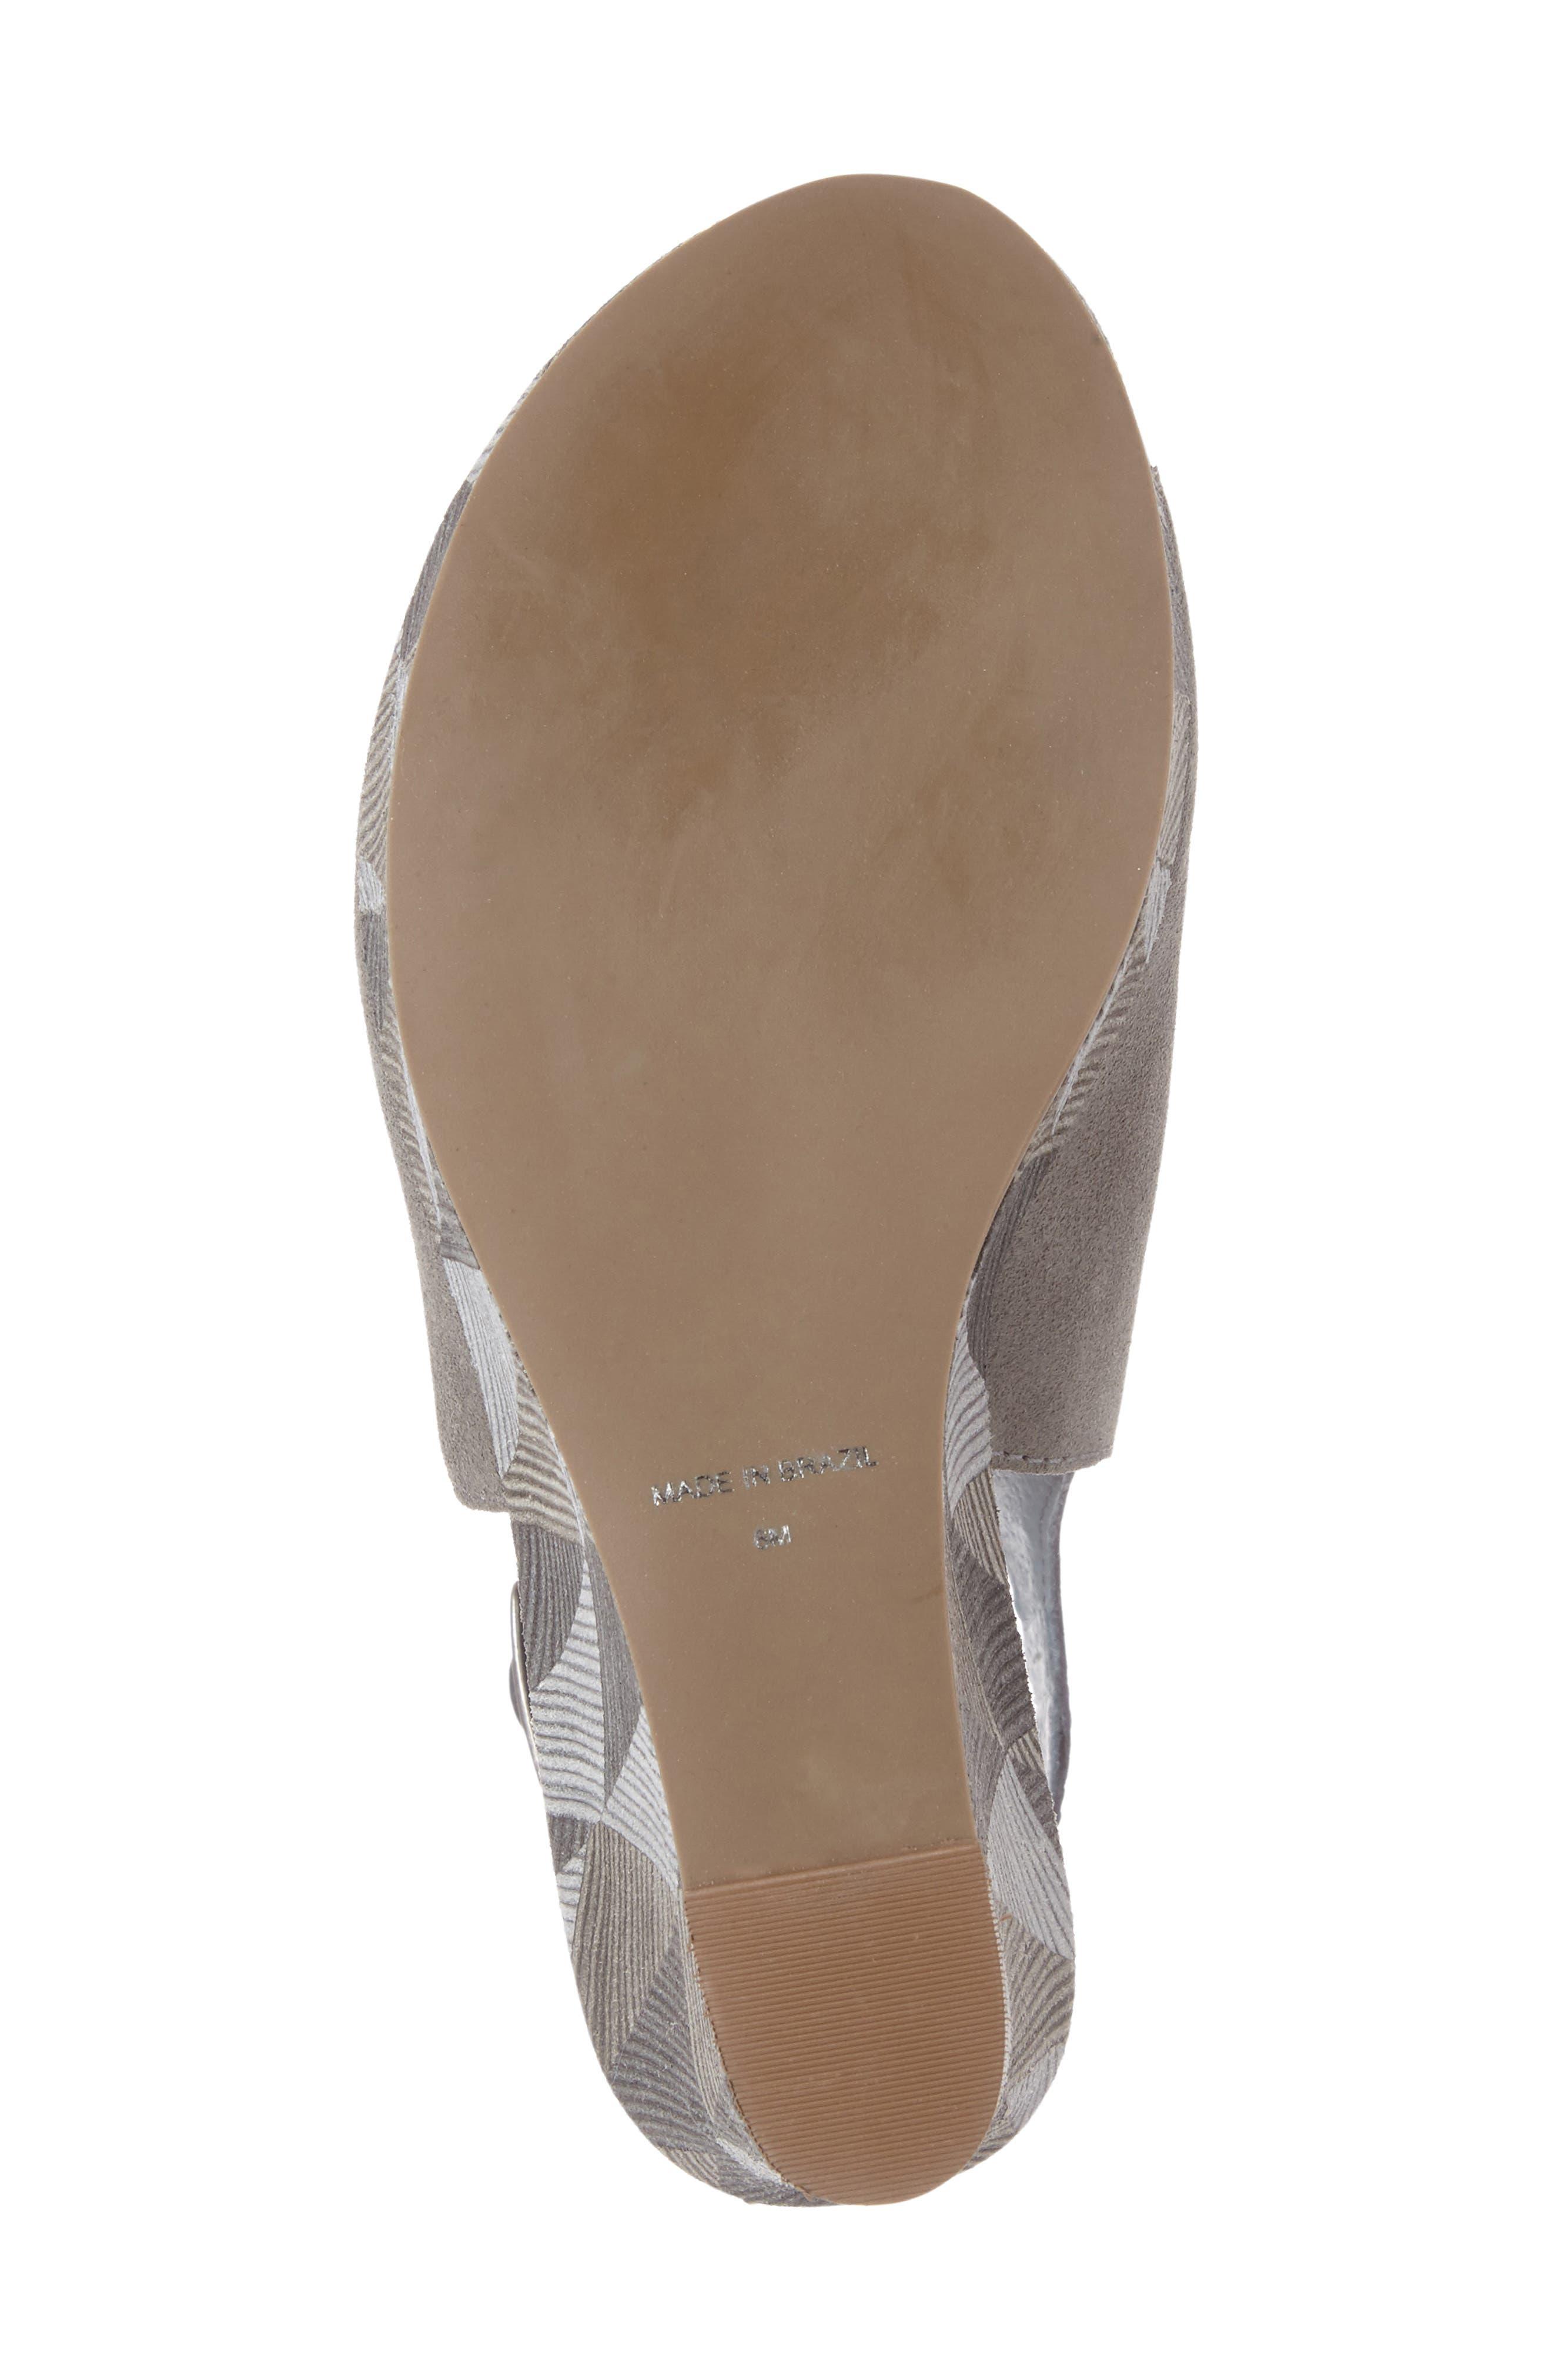 Harlequin Wedge Sandal,                             Alternate thumbnail 6, color,                             029